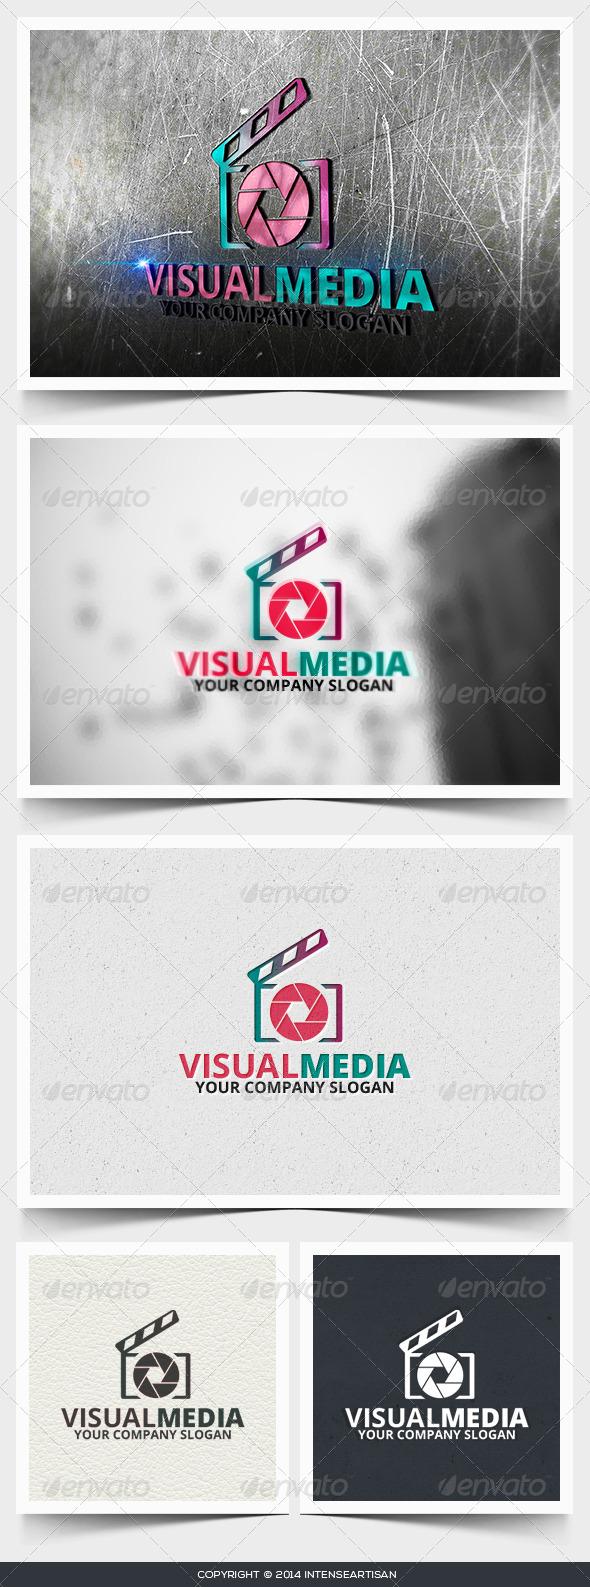 GraphicRiver Visual Media Logo Template 6643838